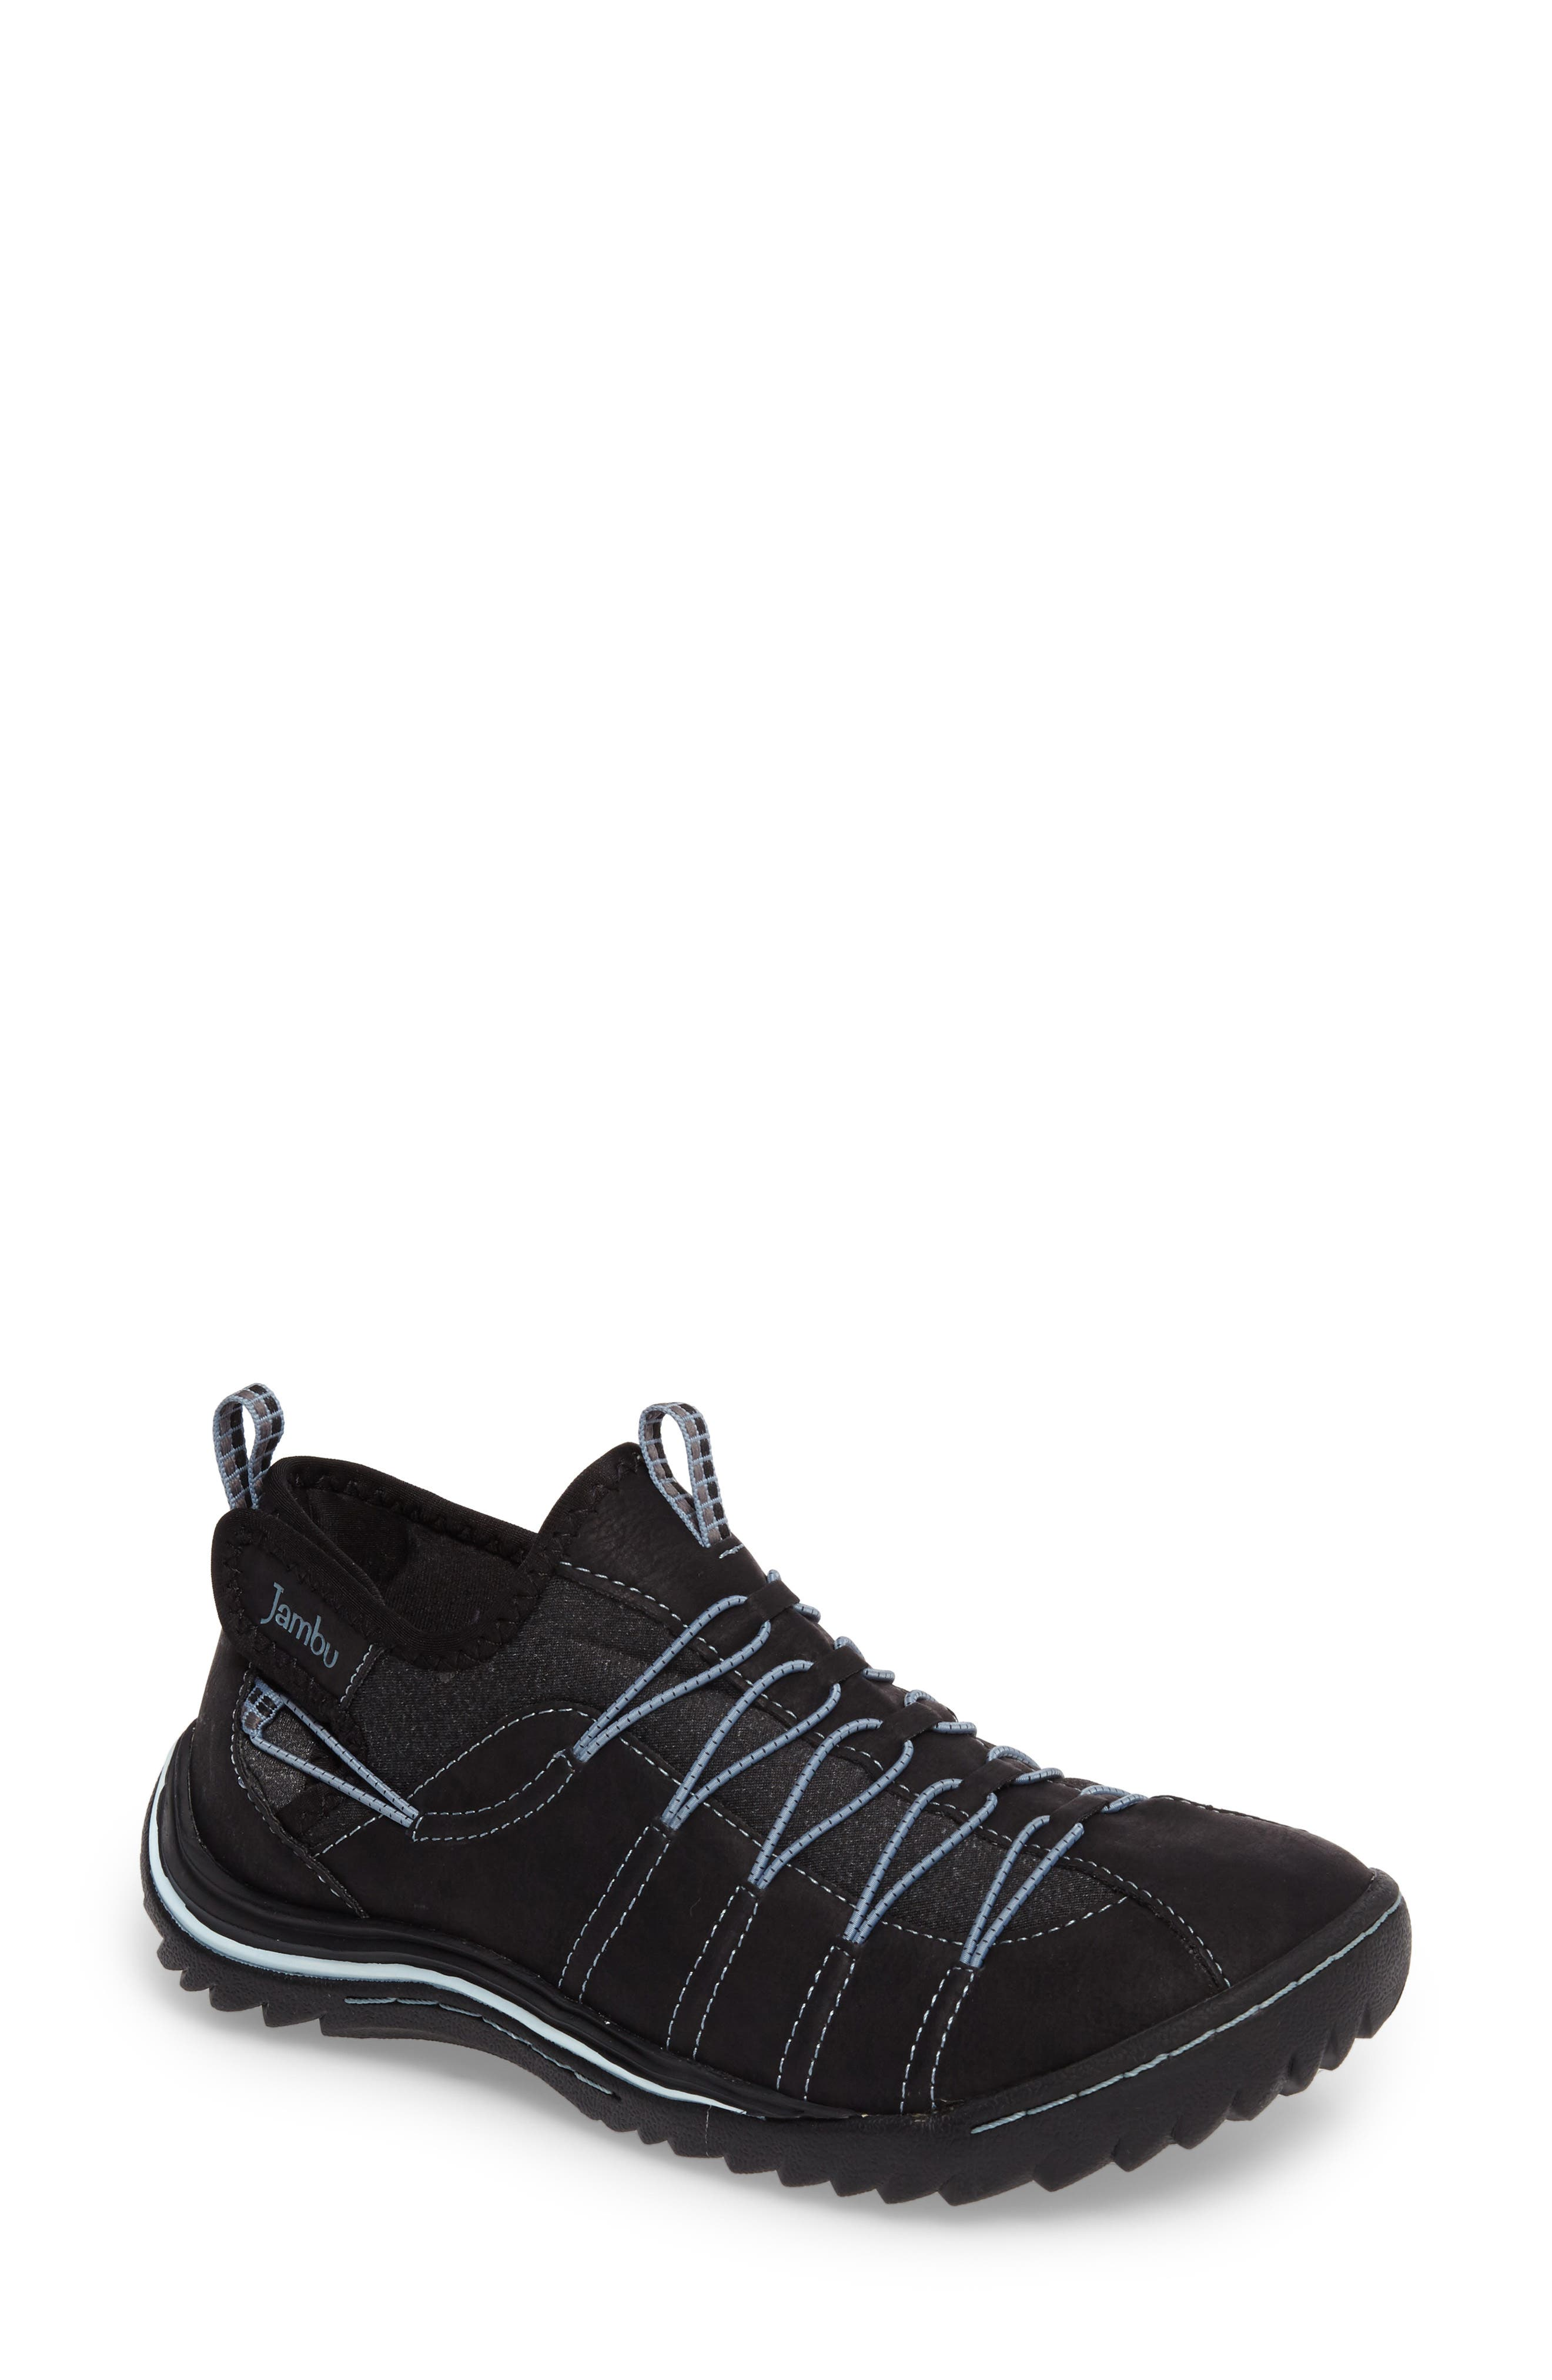 Spirit Sneaker,                             Main thumbnail 1, color,                             Black/ Blue Smoke Leather